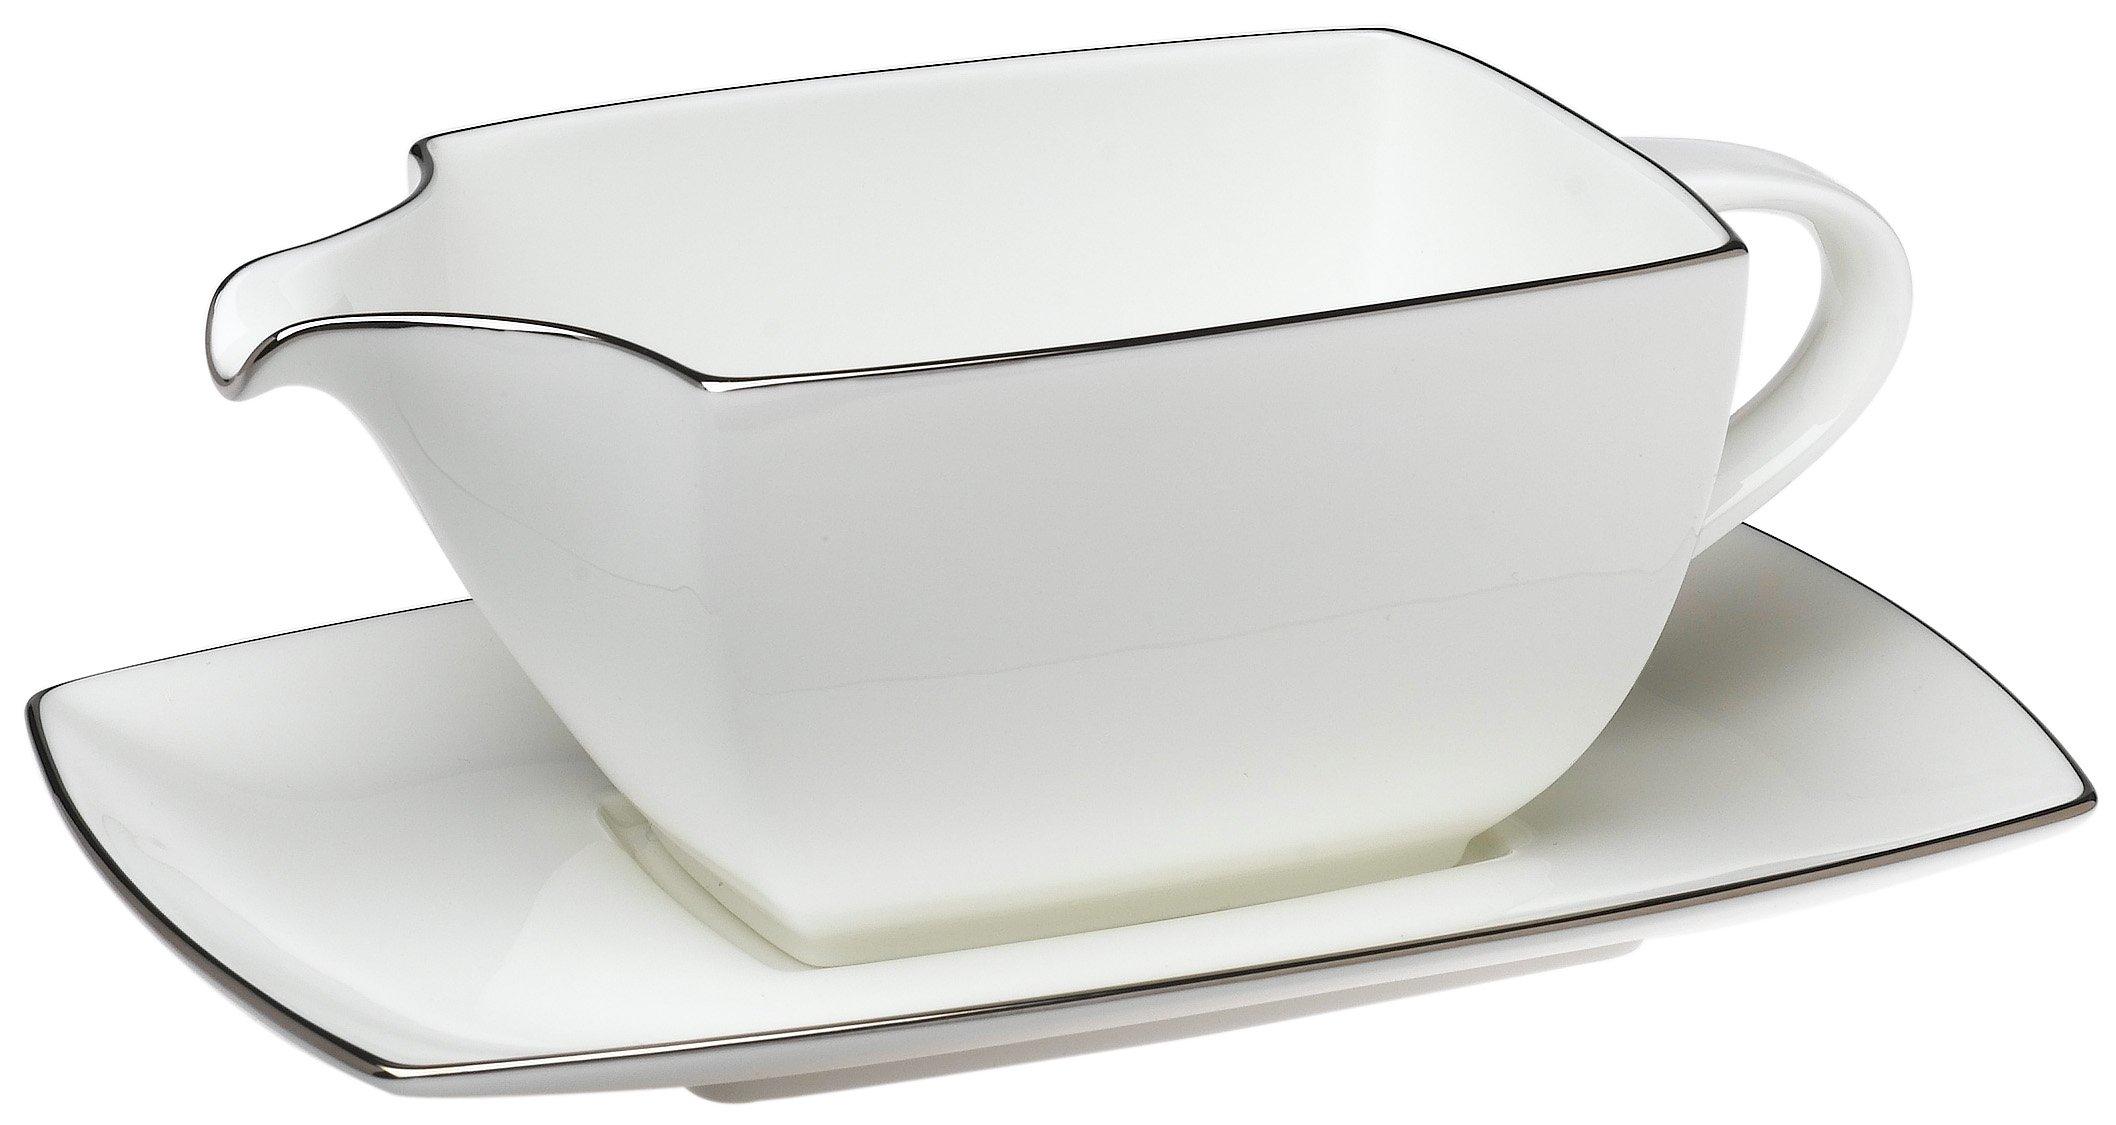 Mikasa Couture Platinum 2-Piece Gravy Boat Set